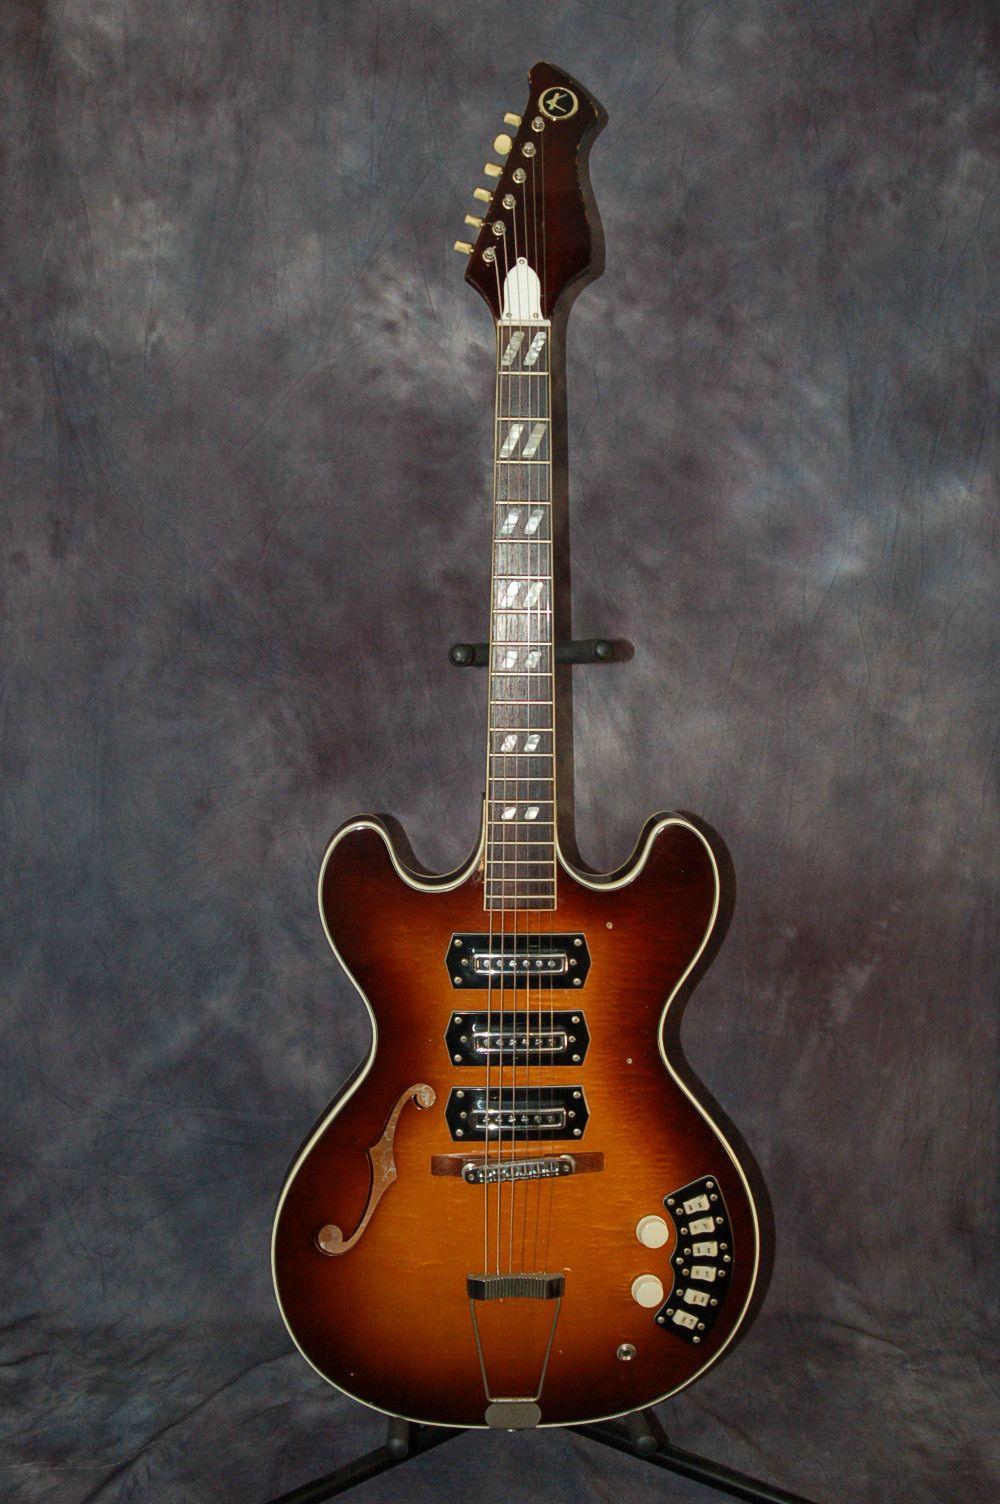 Vintage Rare 1967 Kay Titan Semi Hollow 3 Pickup Thinline Electric Guitar Guitar Electric Guitar Vintage Electric Guitars